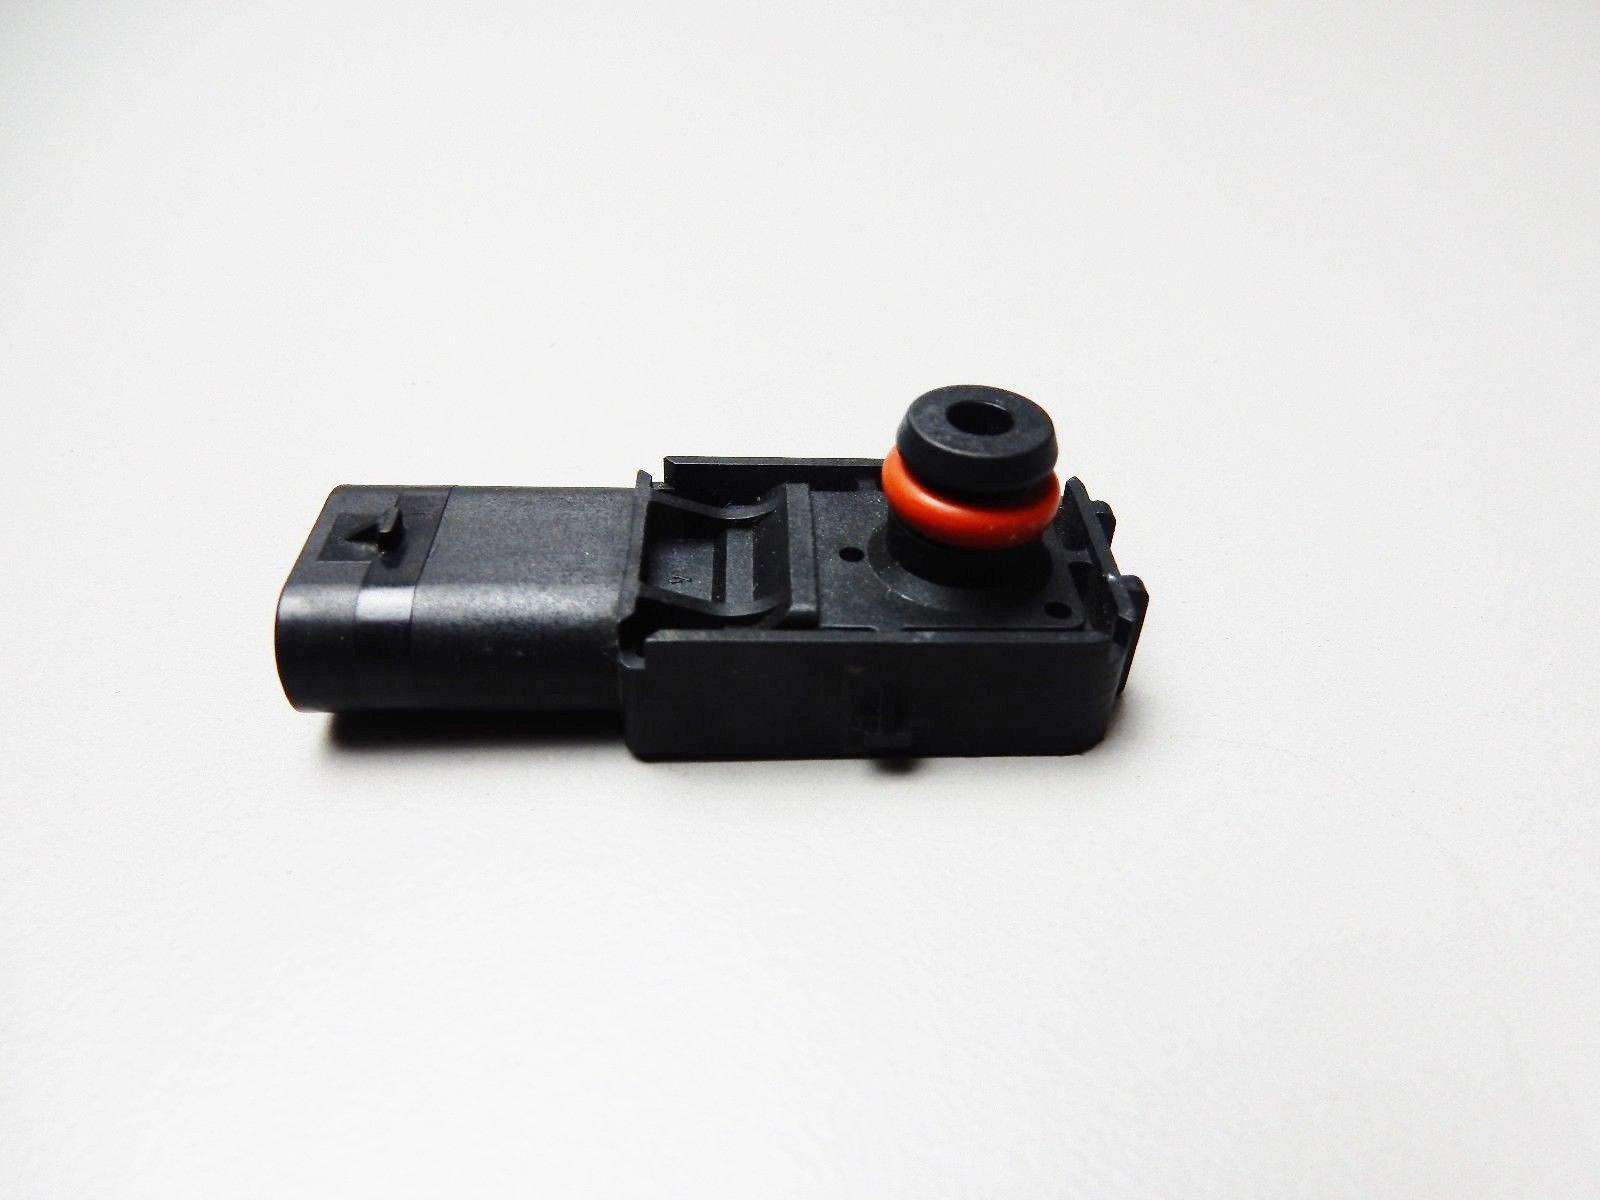 Brake Booster Bose Pressure Sensor for VW Golf MKVII AUDI A3 Q3 A6 OEM# 5Q0906207